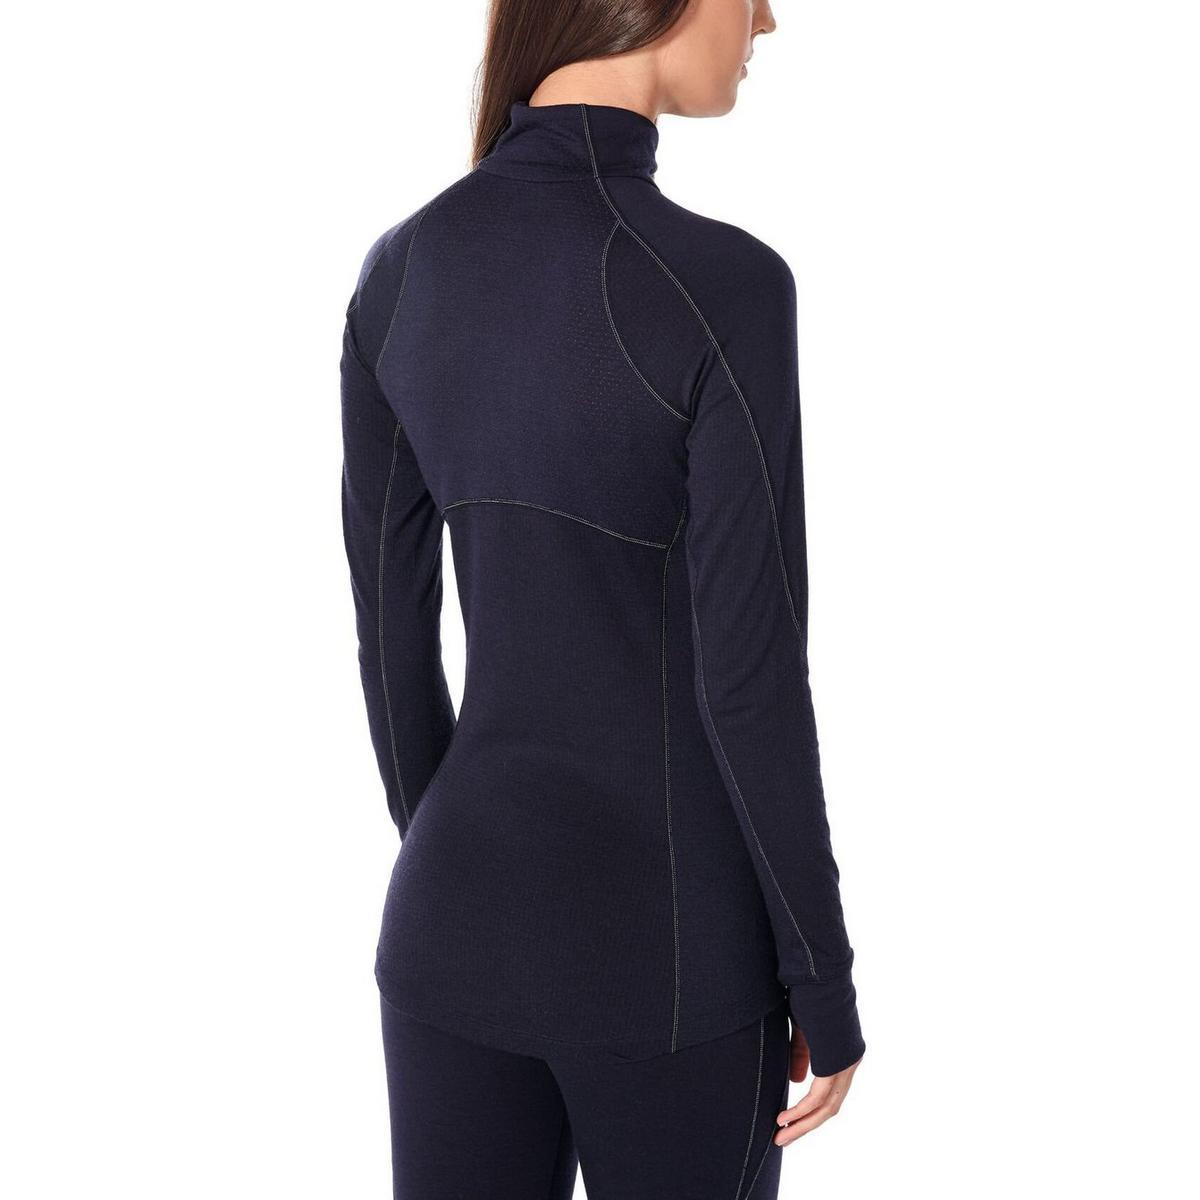 Icebreaker Women's 260 Zone Long Sleeve Half Zip Thermal Top - Nightfall